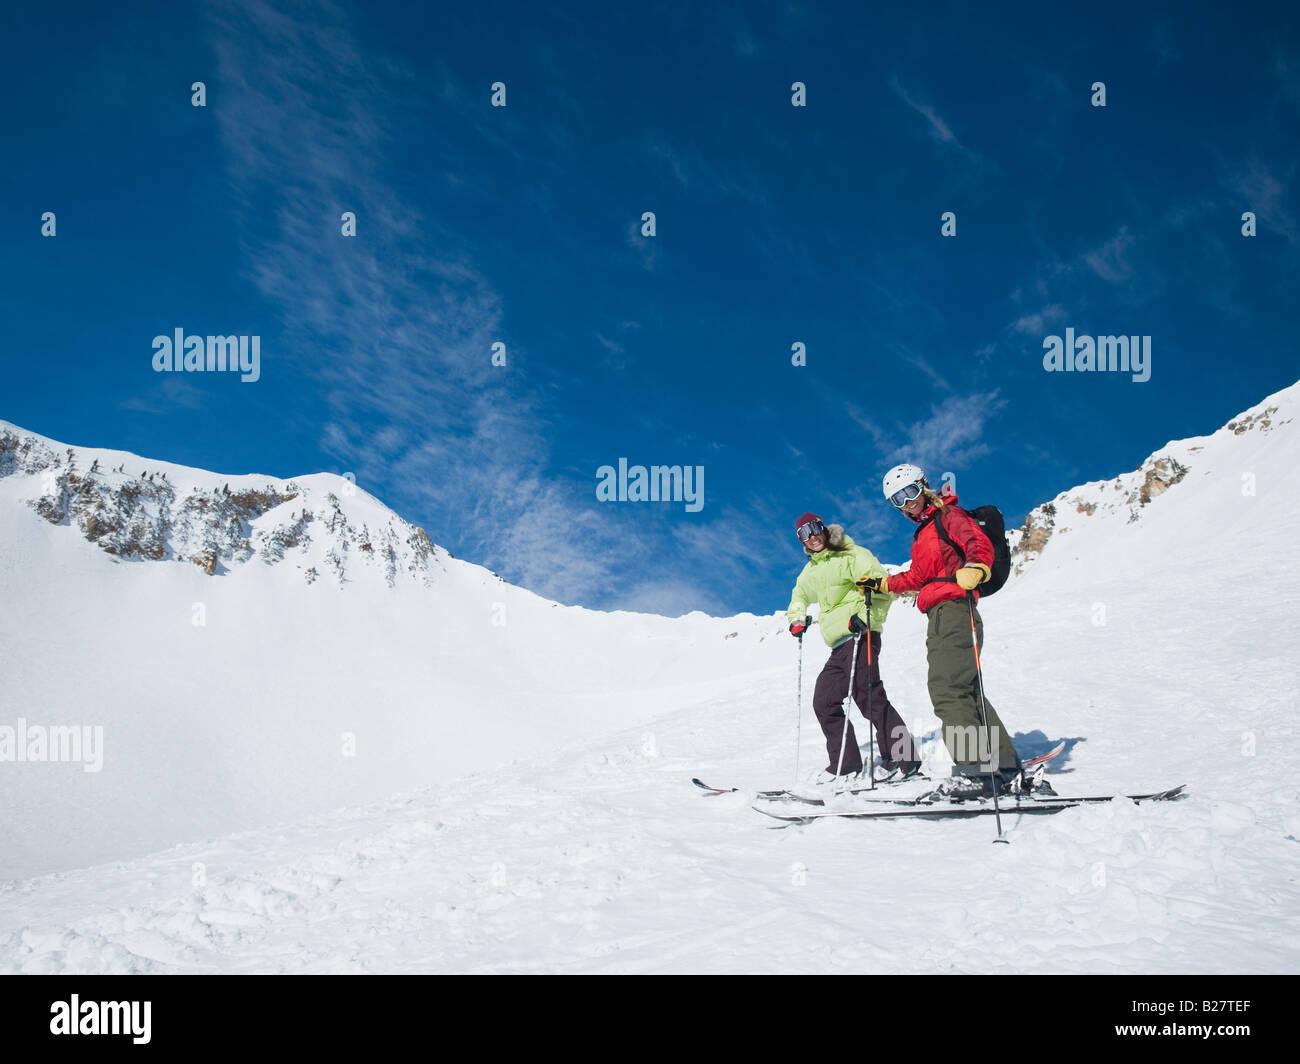 Women standing on skis - Stock Image